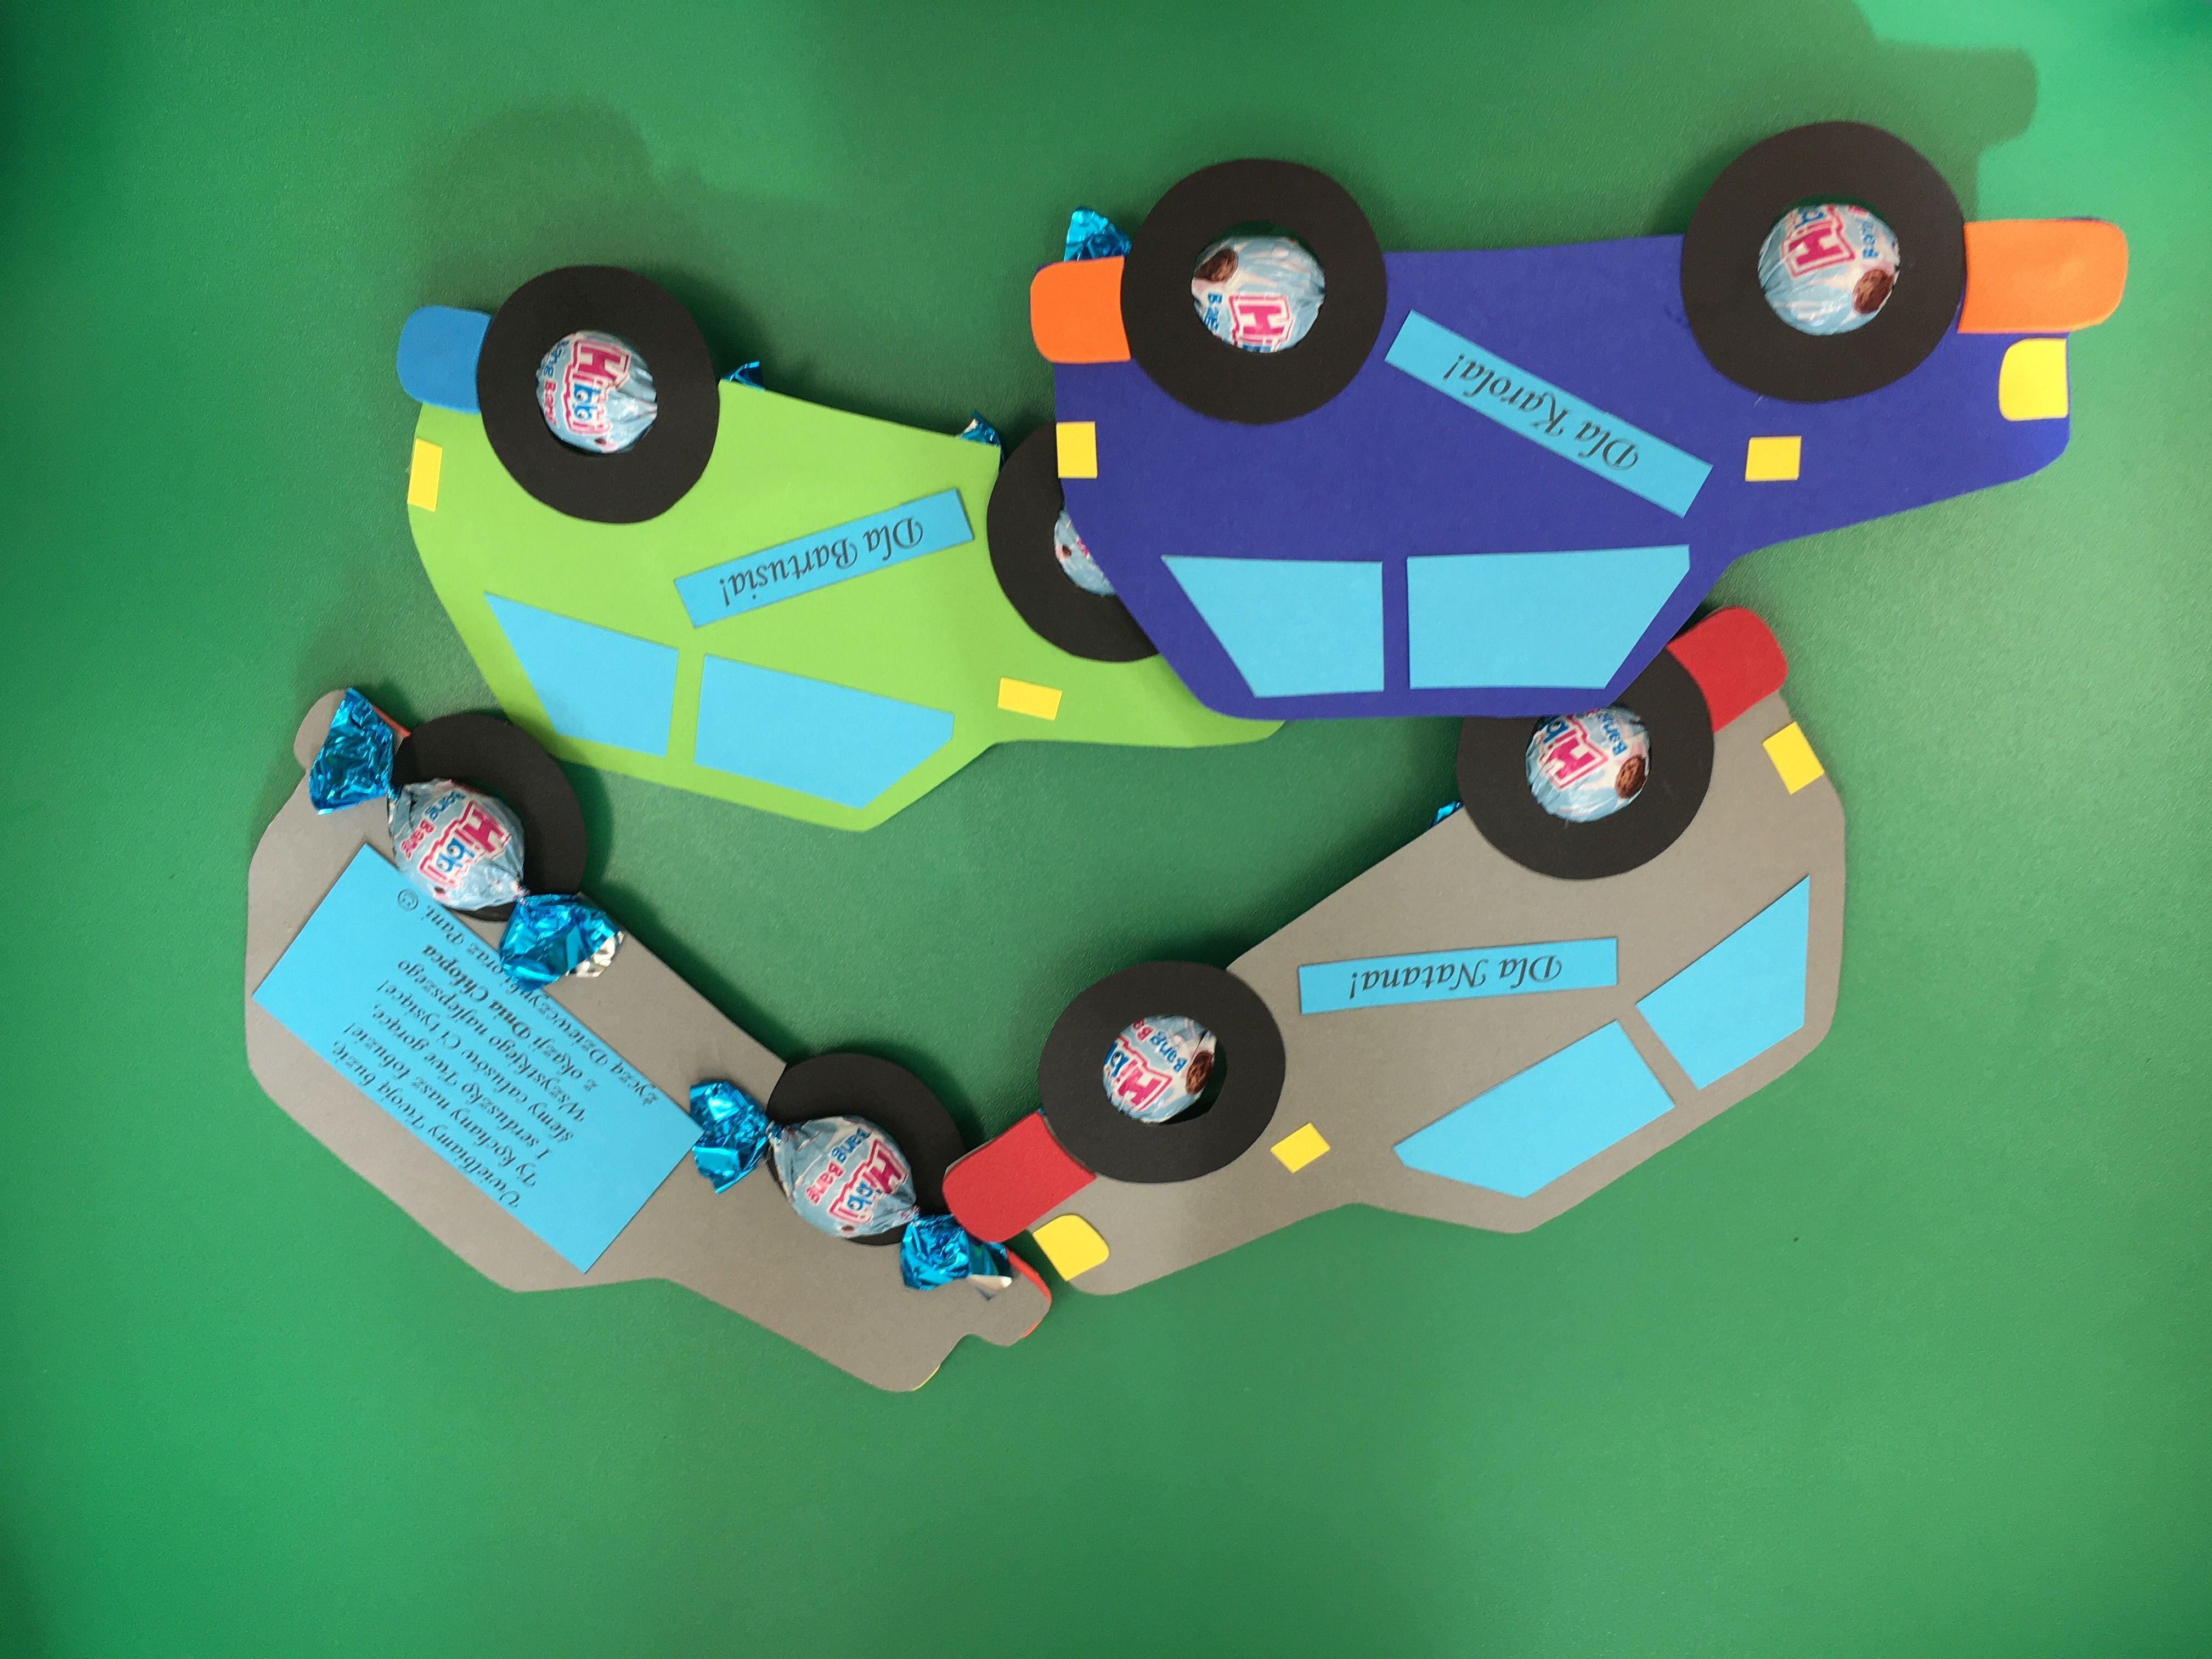 Dzien Chlopaka Boy Samochod Auto Przedszkole Plastyka Gaming Products Electronic Products Game Console